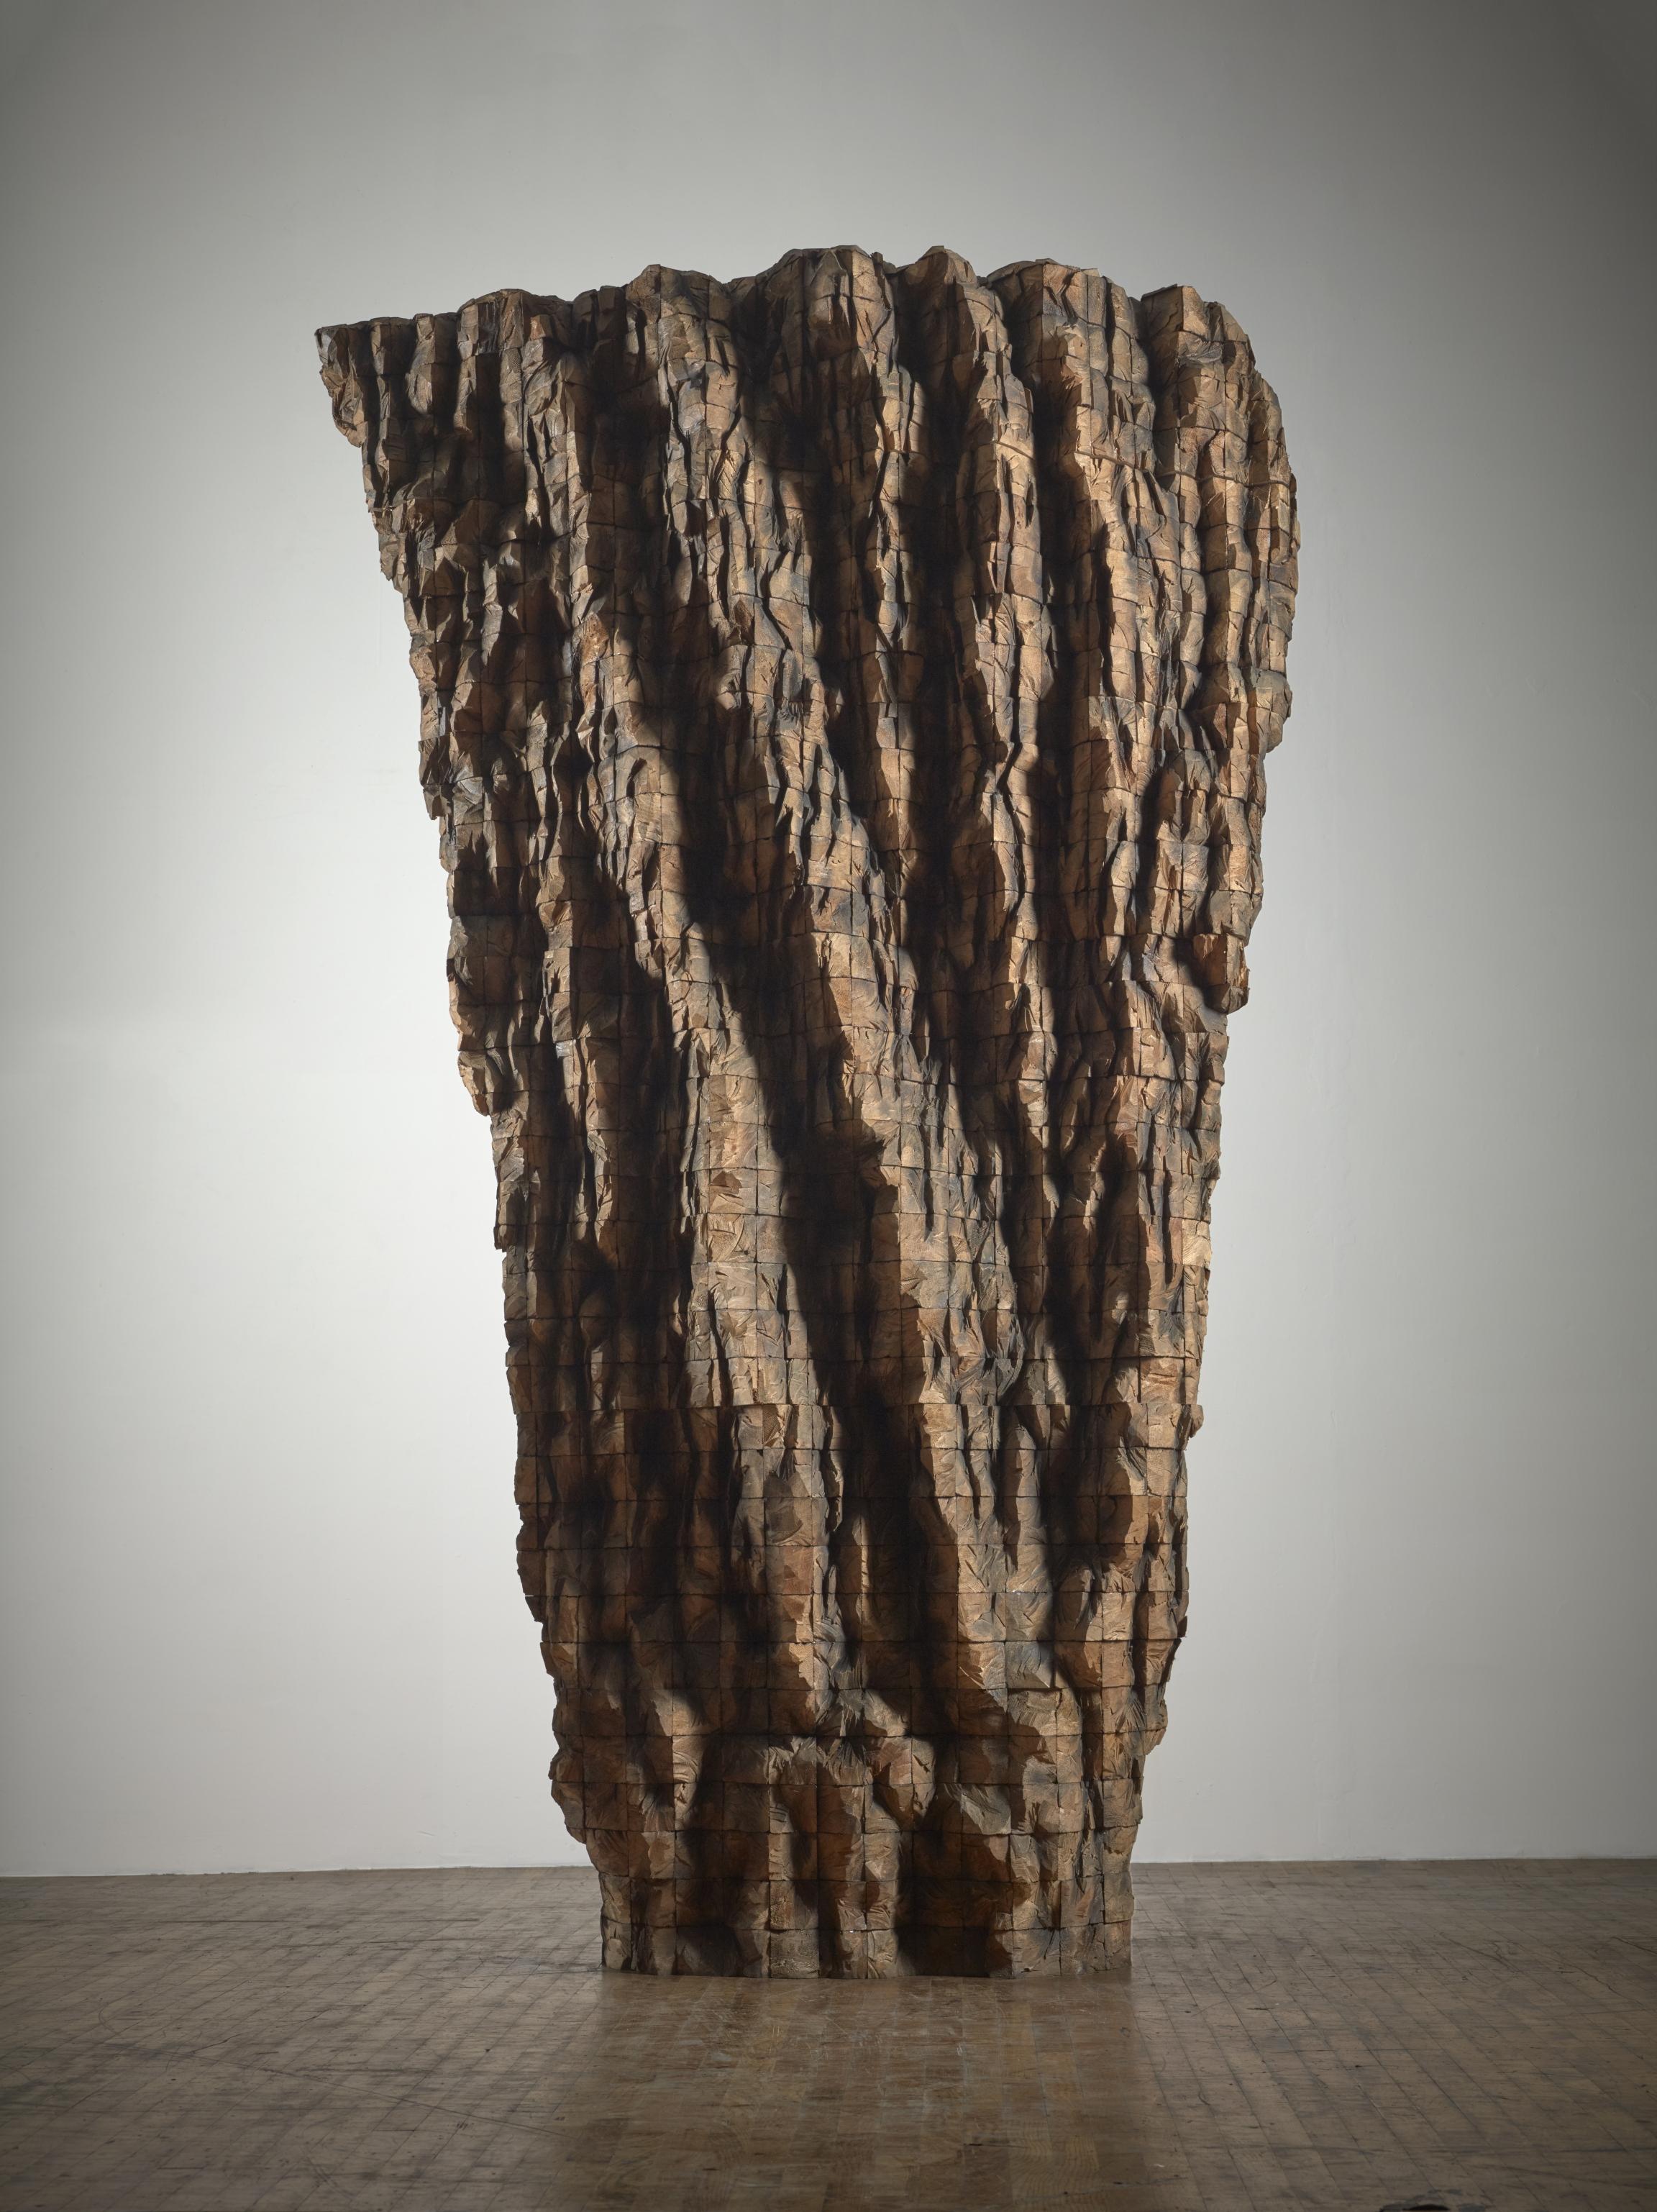 """Krypta I"" by Ursula von Rydingsvard, 2014. Cedar, 125.5 x 77.5 x 56 in."